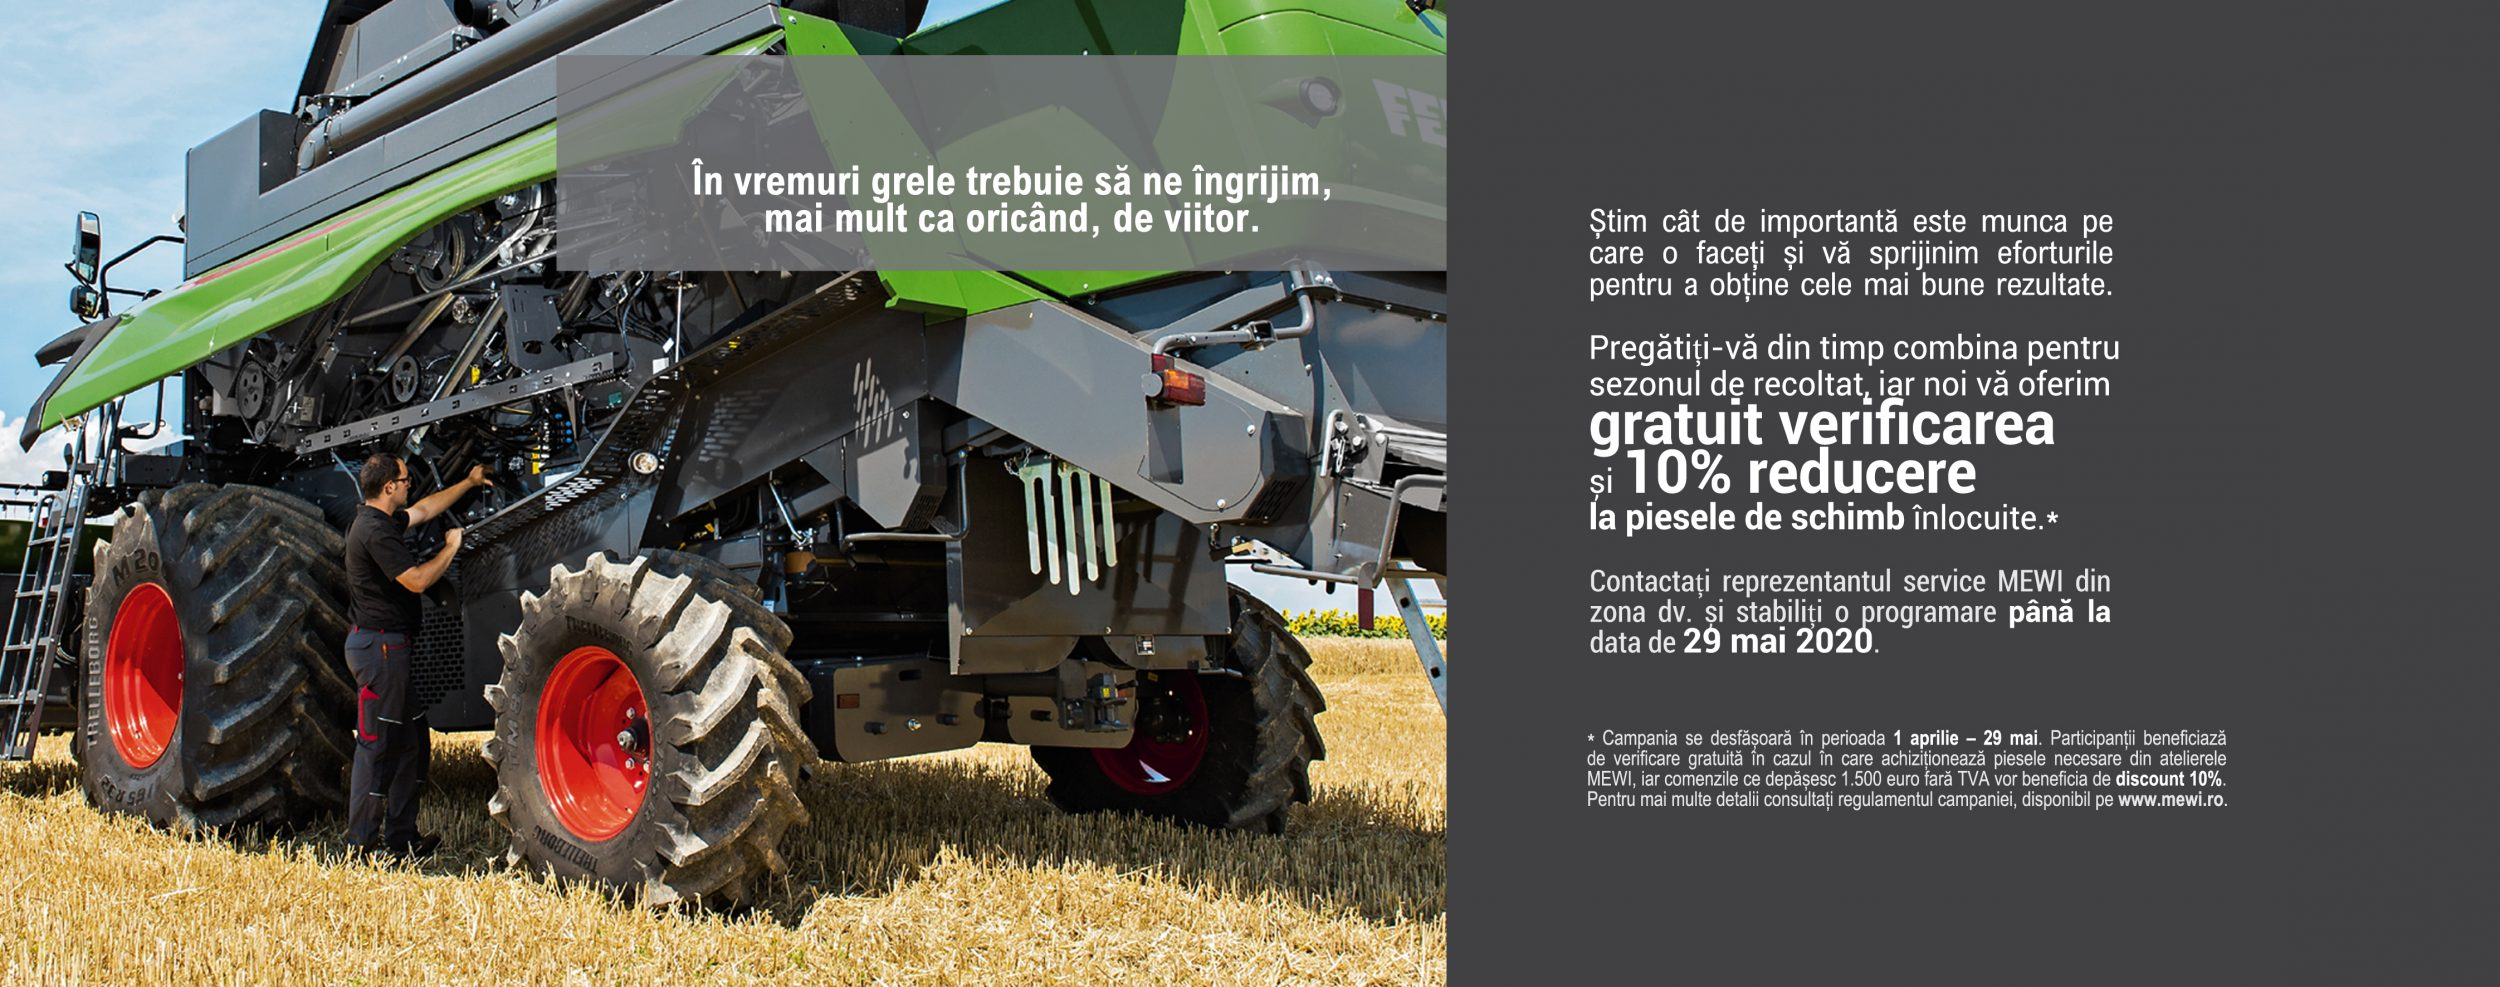 Text promotie MEWI verificare gratuita , stanga combina agricola.